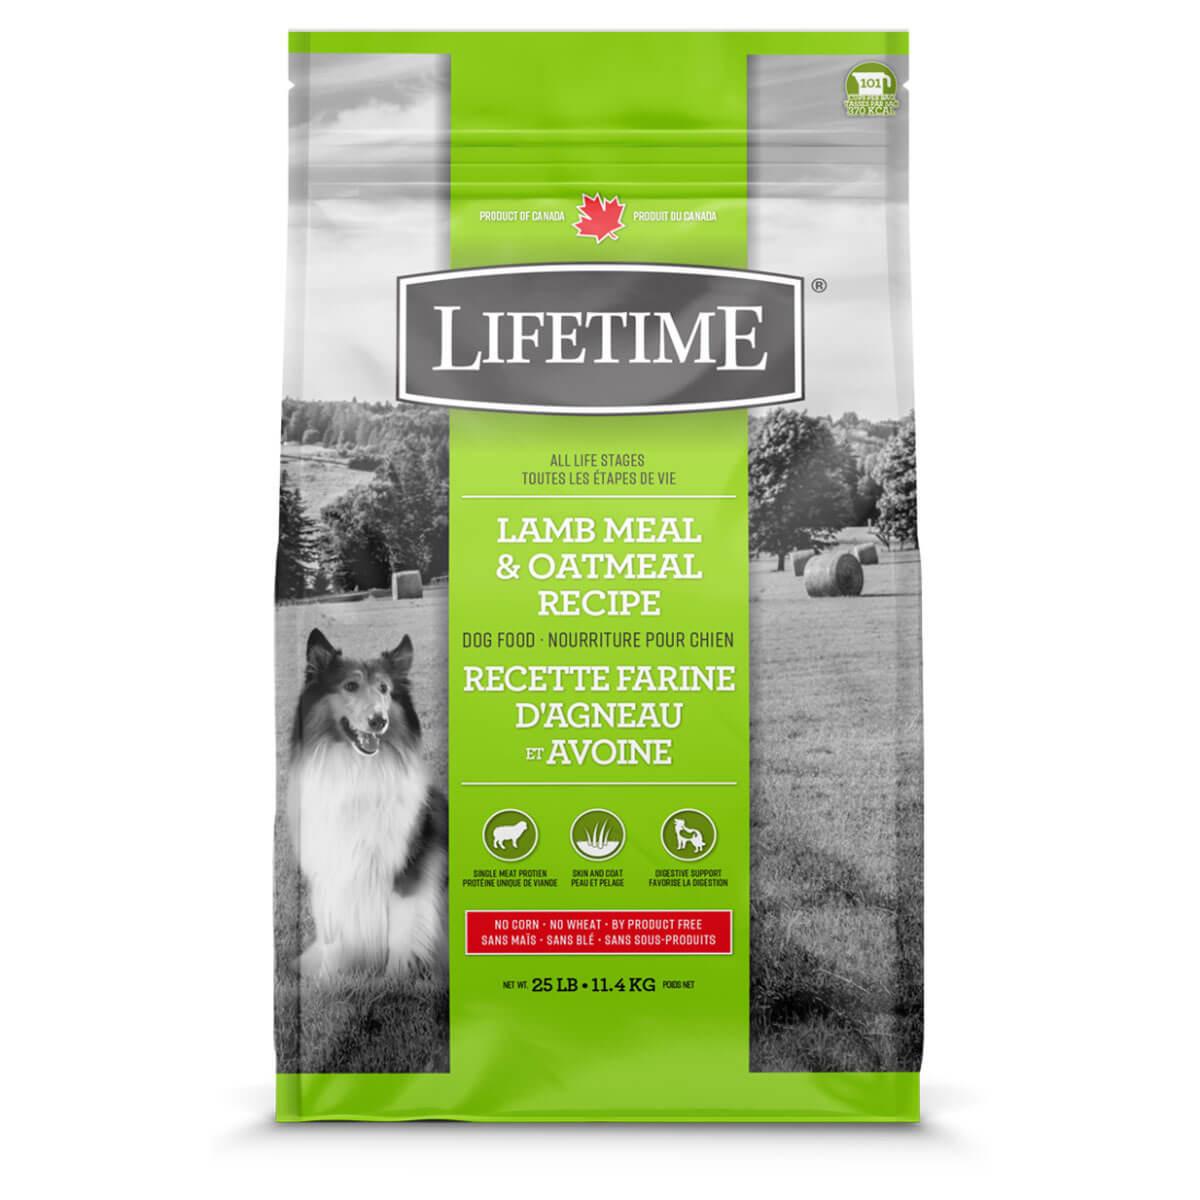 Lifetime Lamb Dog Food - 11.4 kg